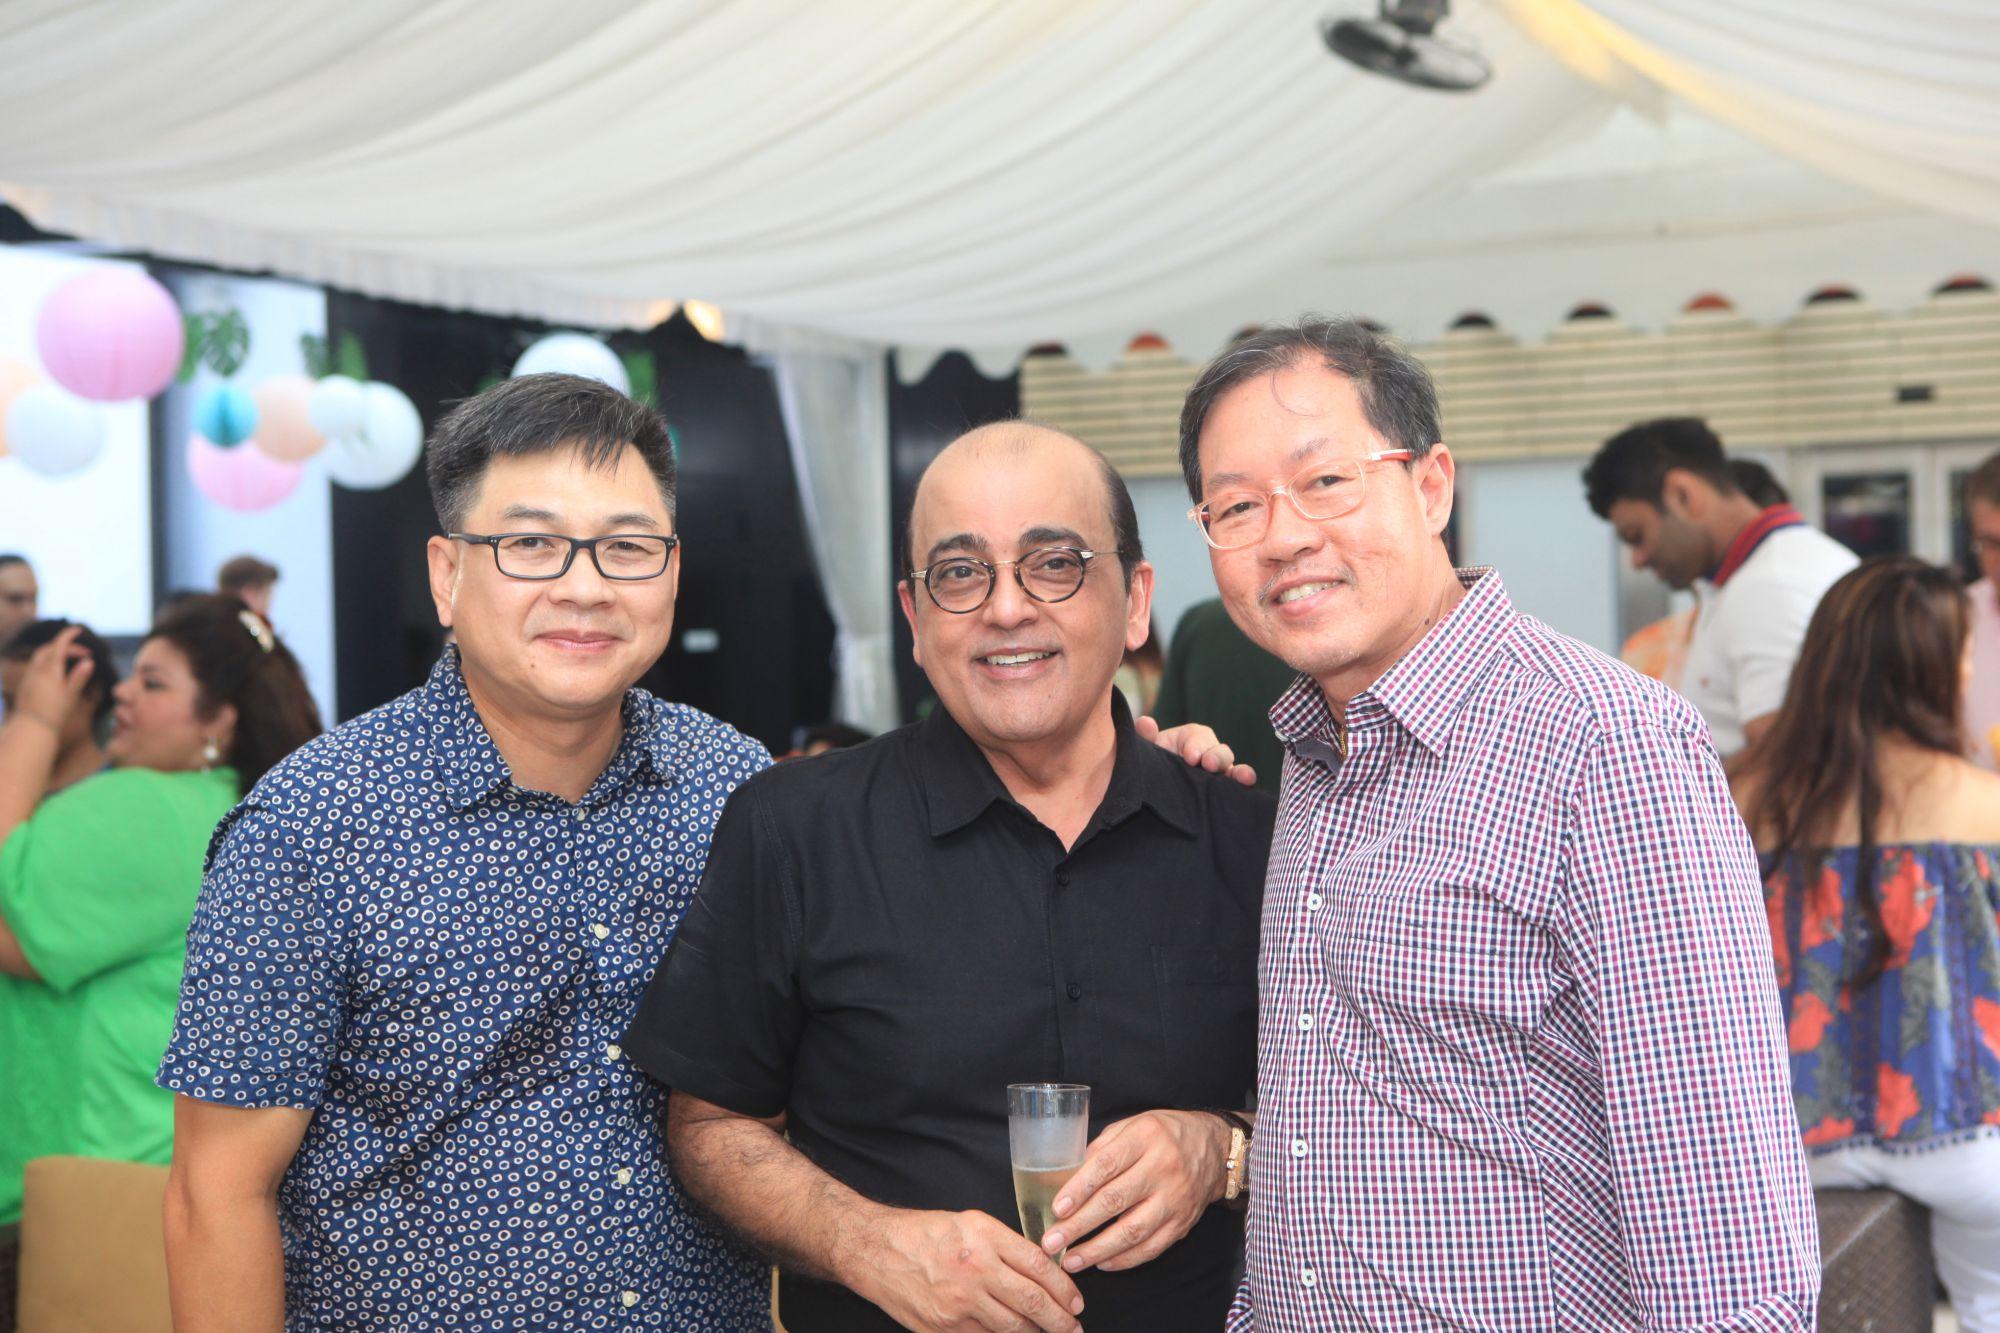 Amos Ong, Asok Hiranandani, Sit Kok Seng